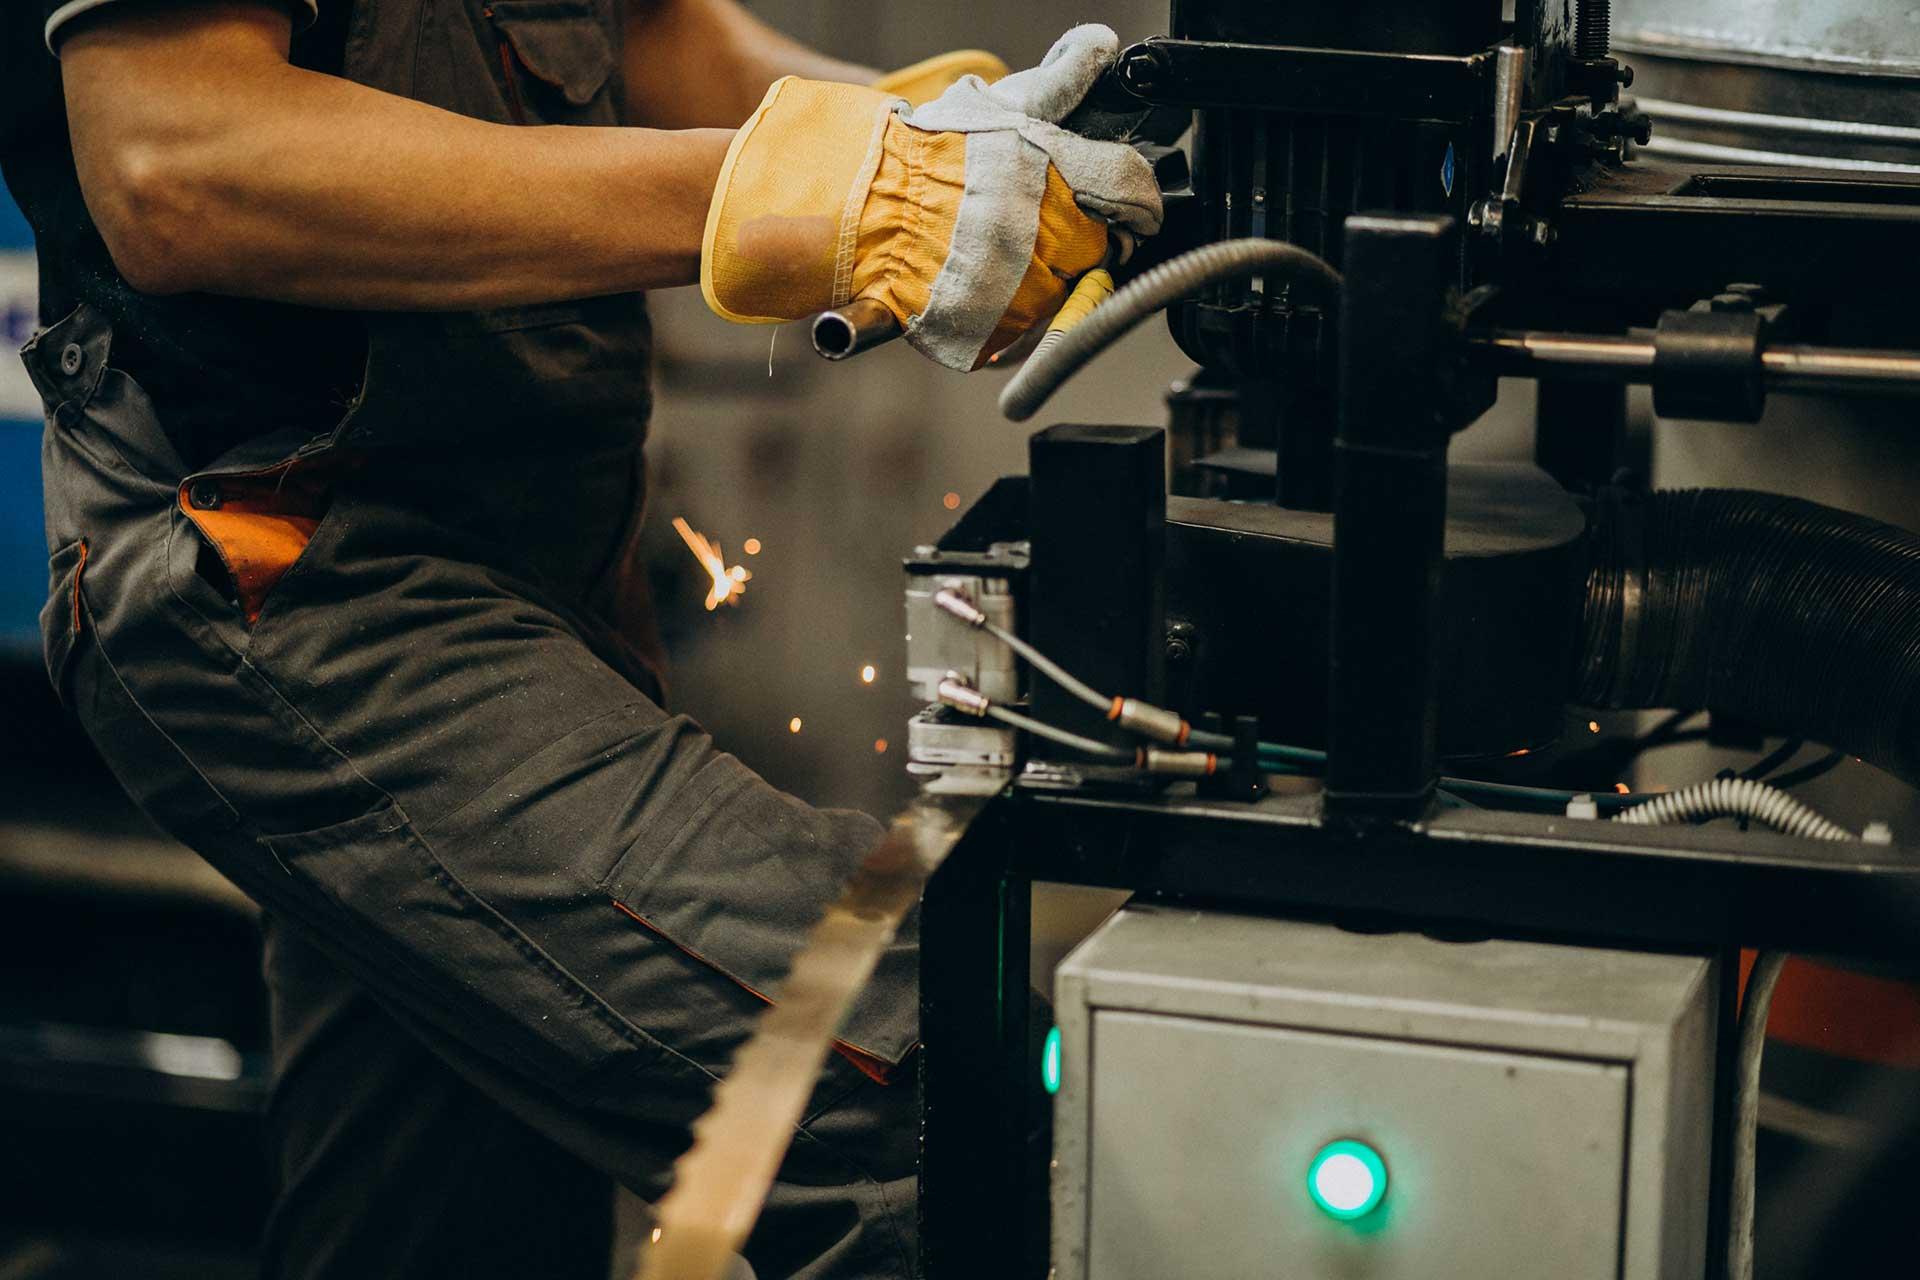 man-working-steel-fatory-equipment-steel-production